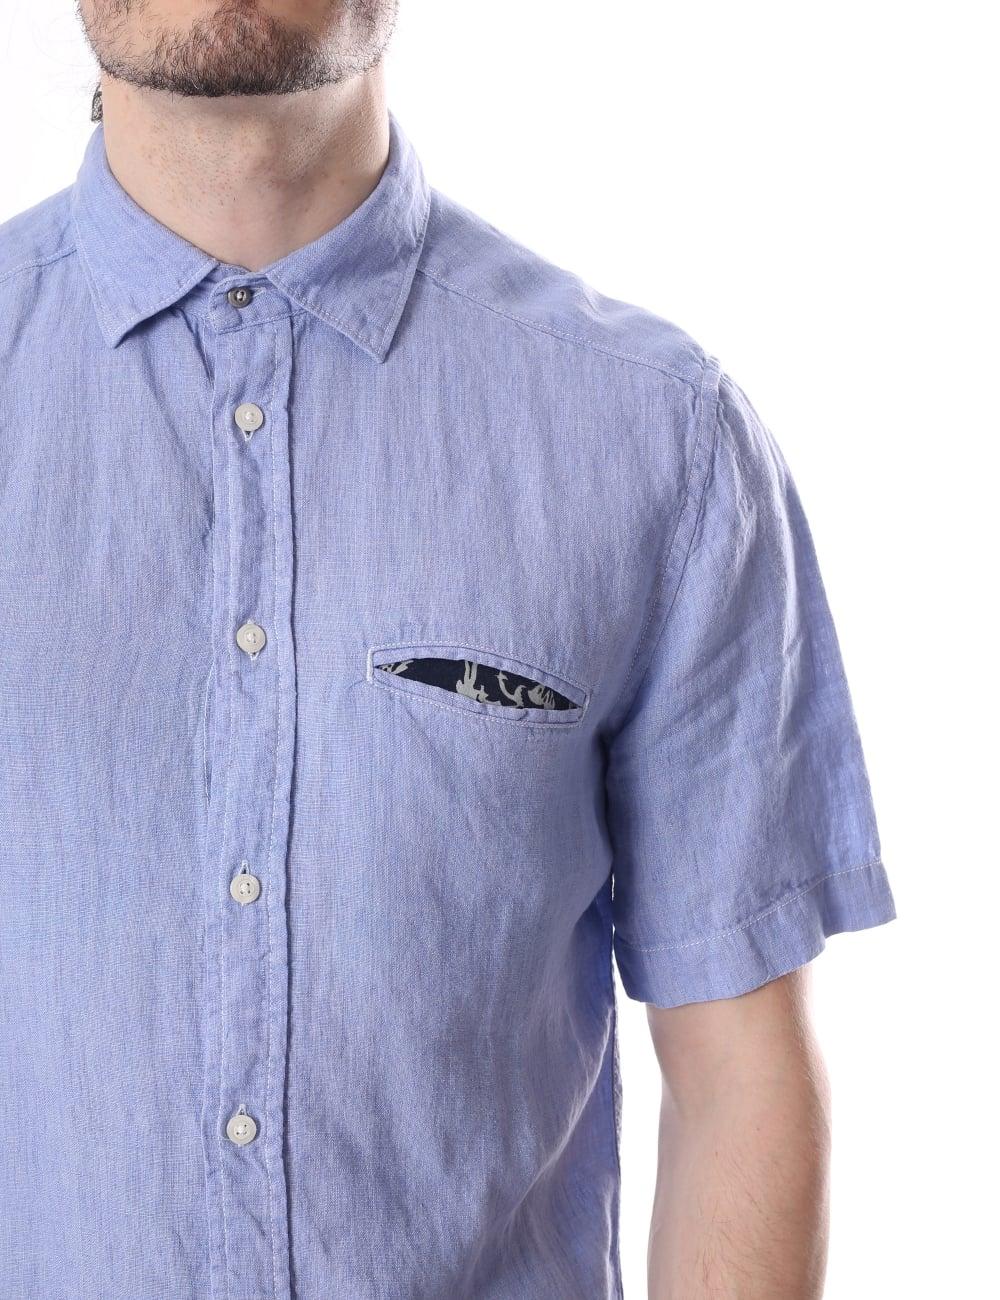 1ffa065fe07 Diesel S-Emoko Pocket Square Men s Short Sleeve Shirt Chambray